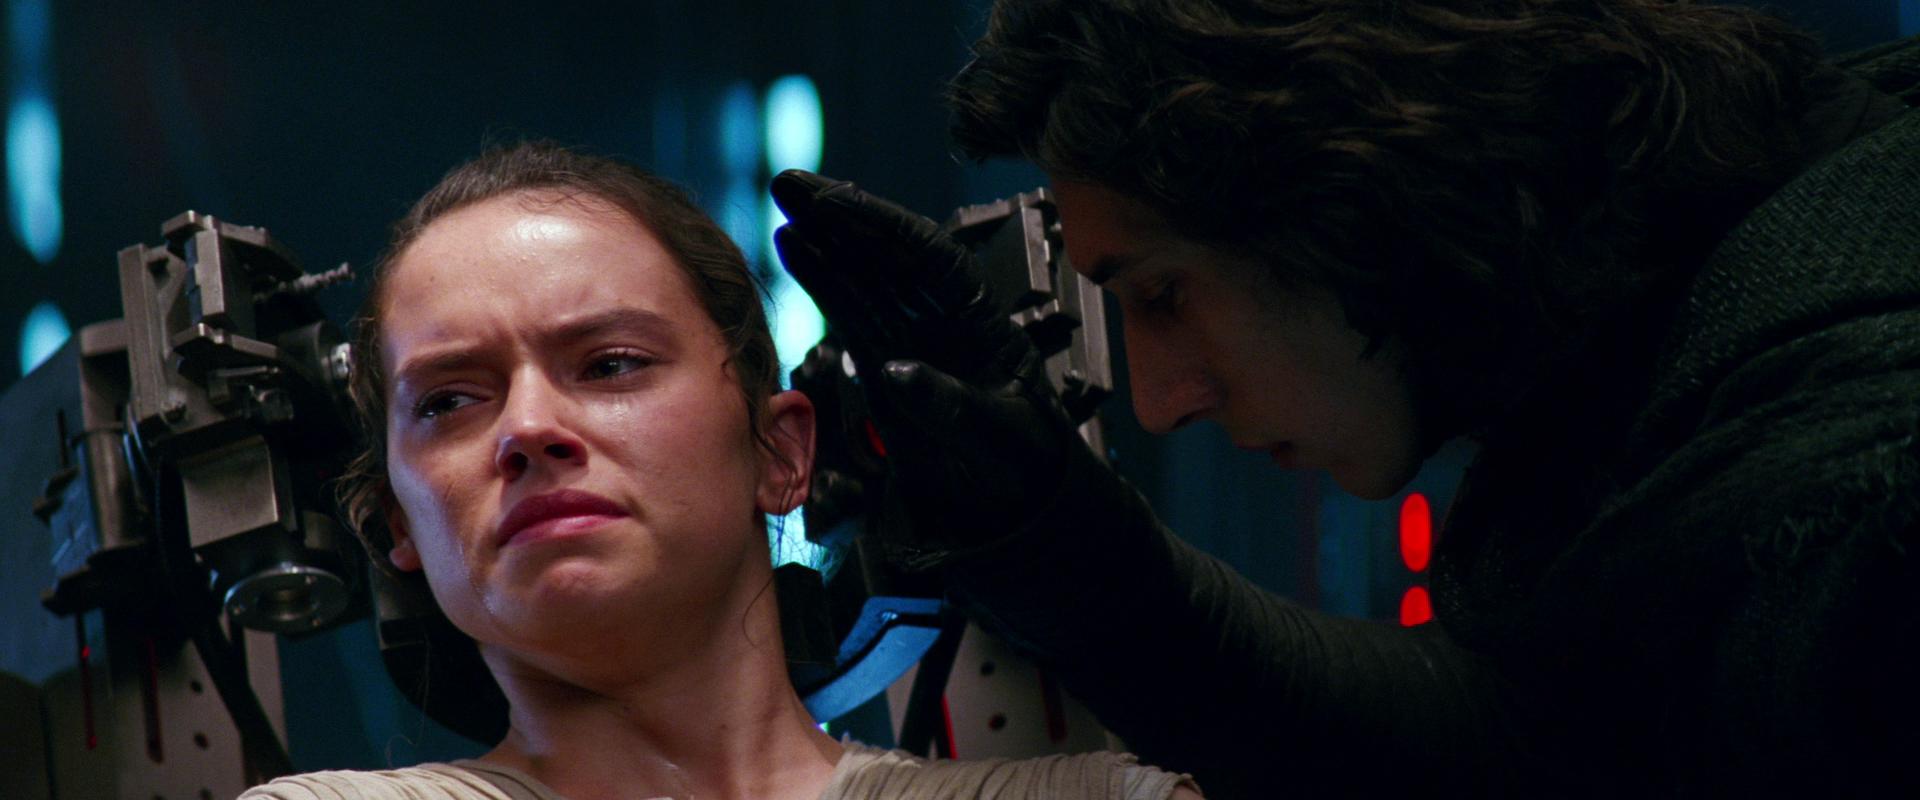 star wars luke and leia relationship test